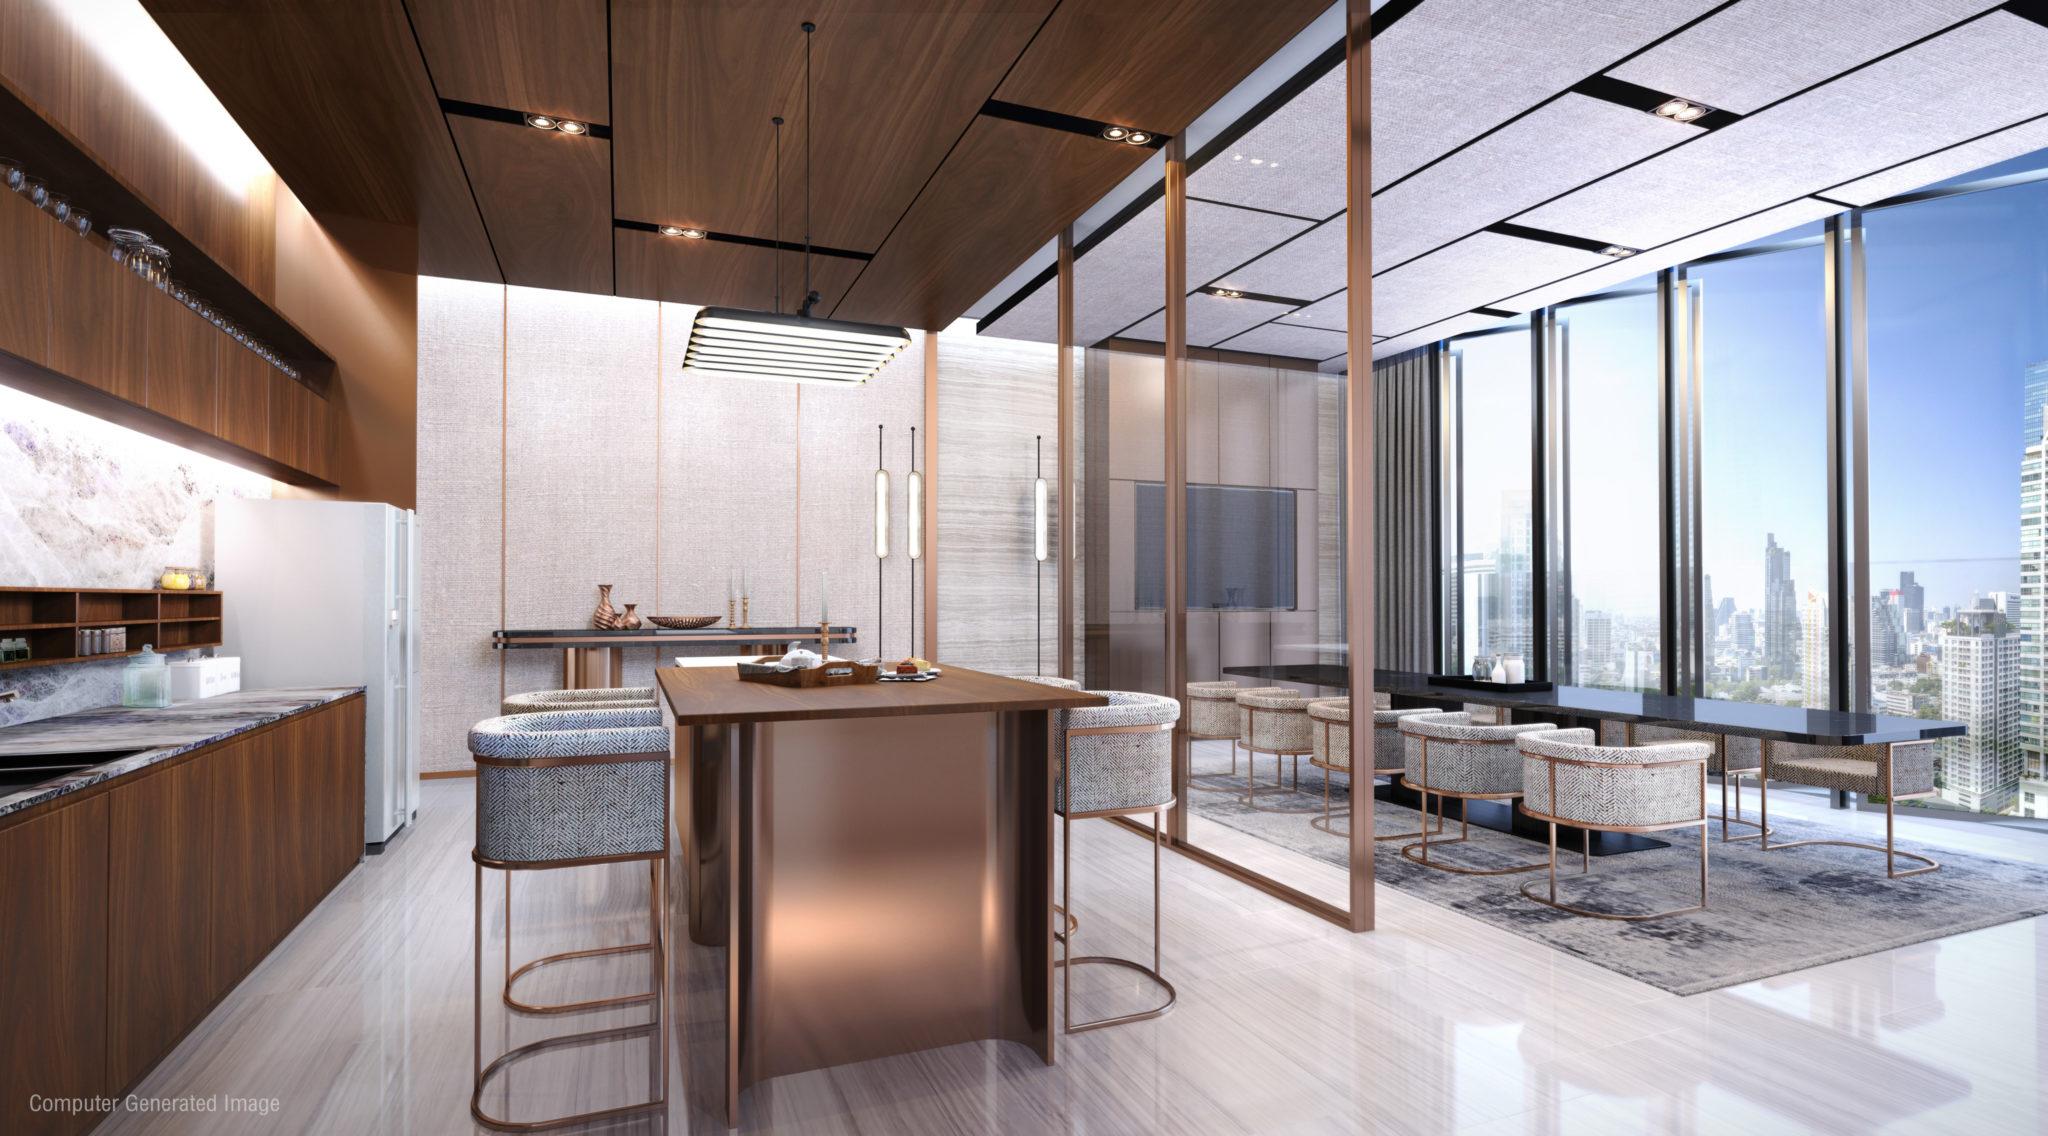 ANIL Sathorn 12 คอนโดสาทรสุดหรูที่ยกระดับคุณภาพชีวิตของผู้พักอาศัย ด้วยมาตรฐาน WELL Building Standard 22 - GRAND UNITY